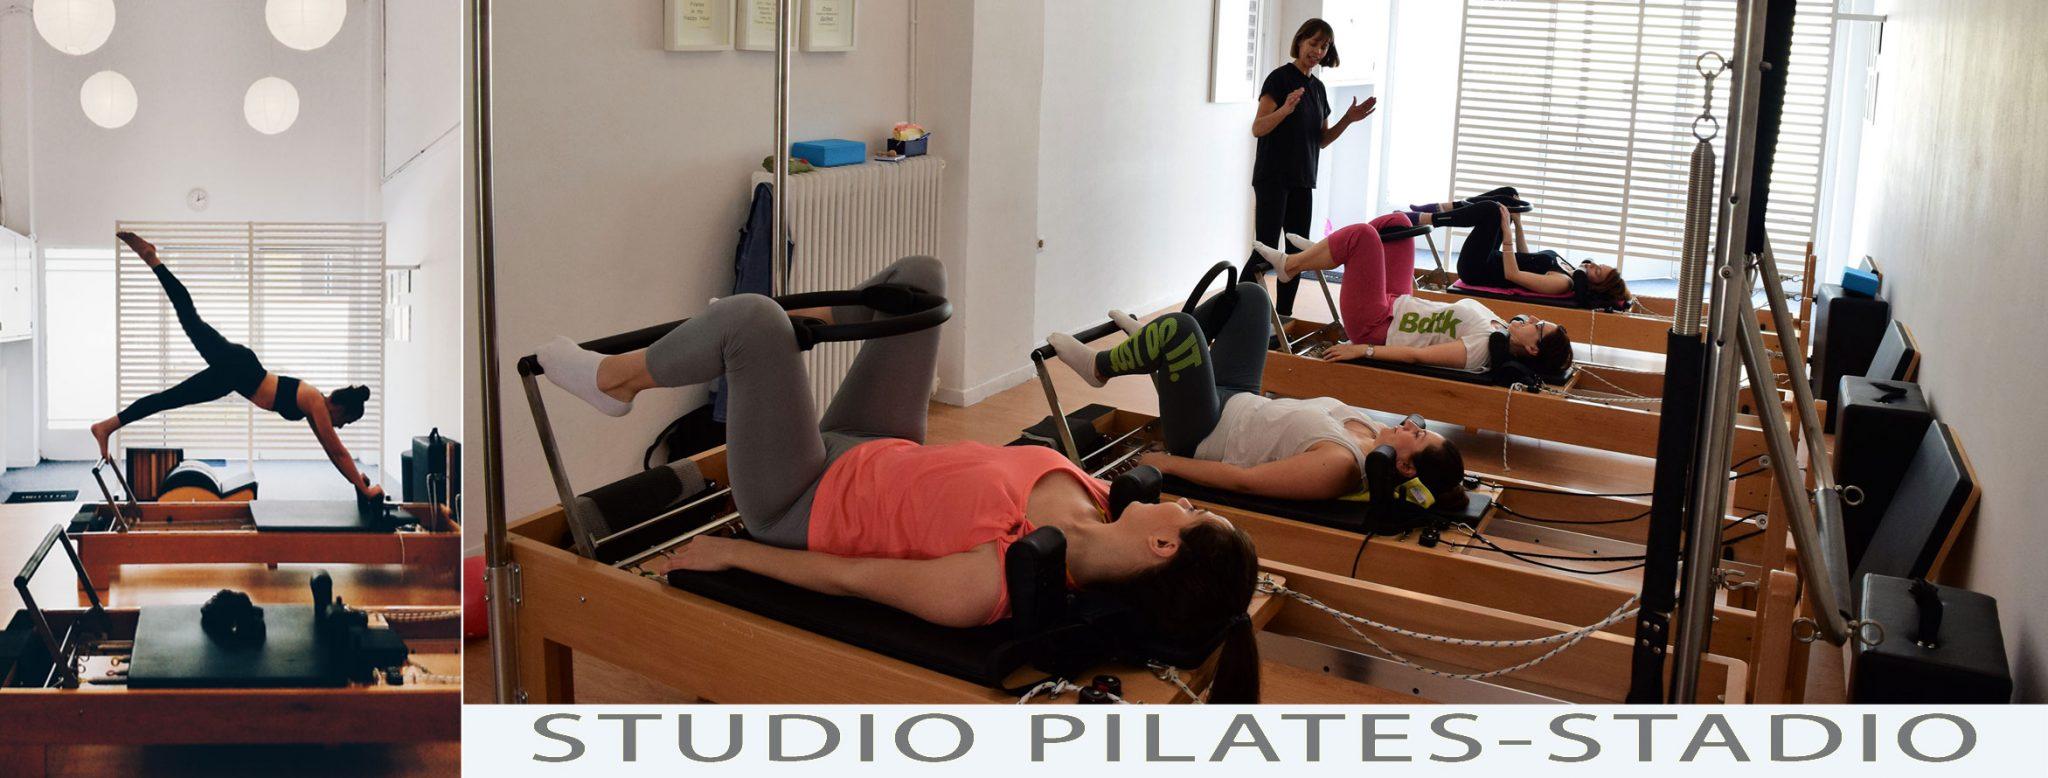 Pilates Μηχανήματα 2